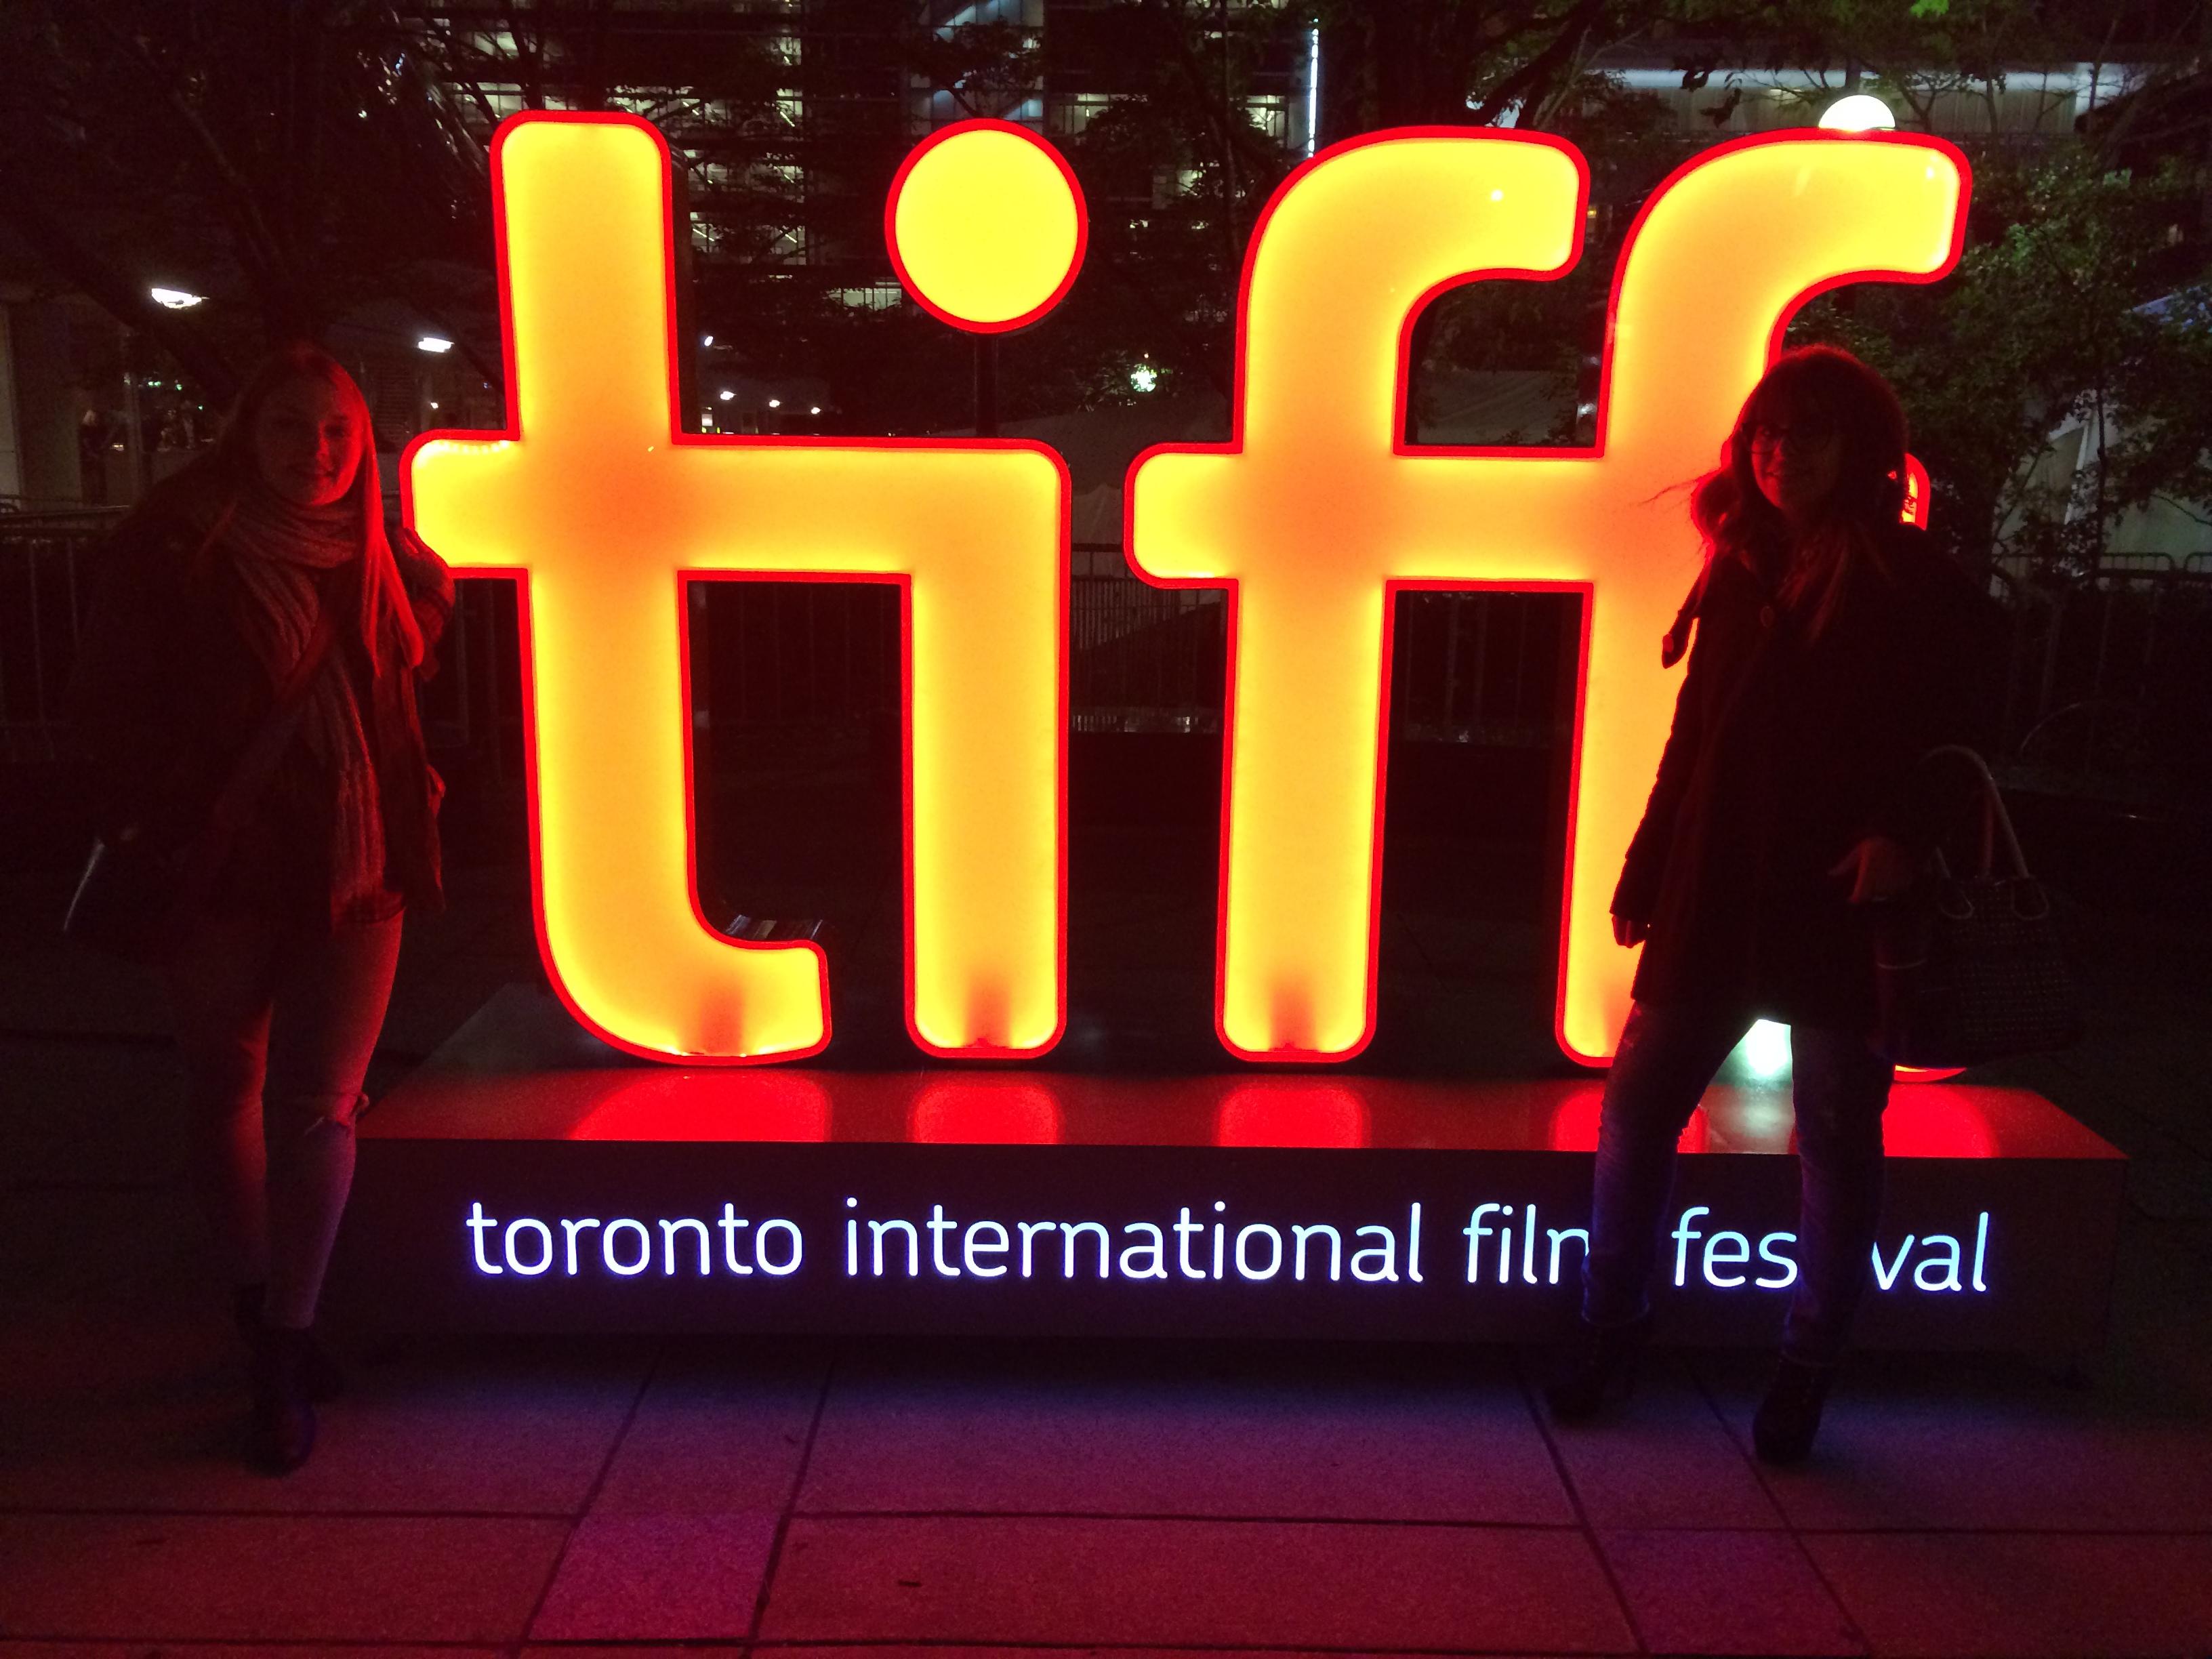 Tiff-2014-toronto